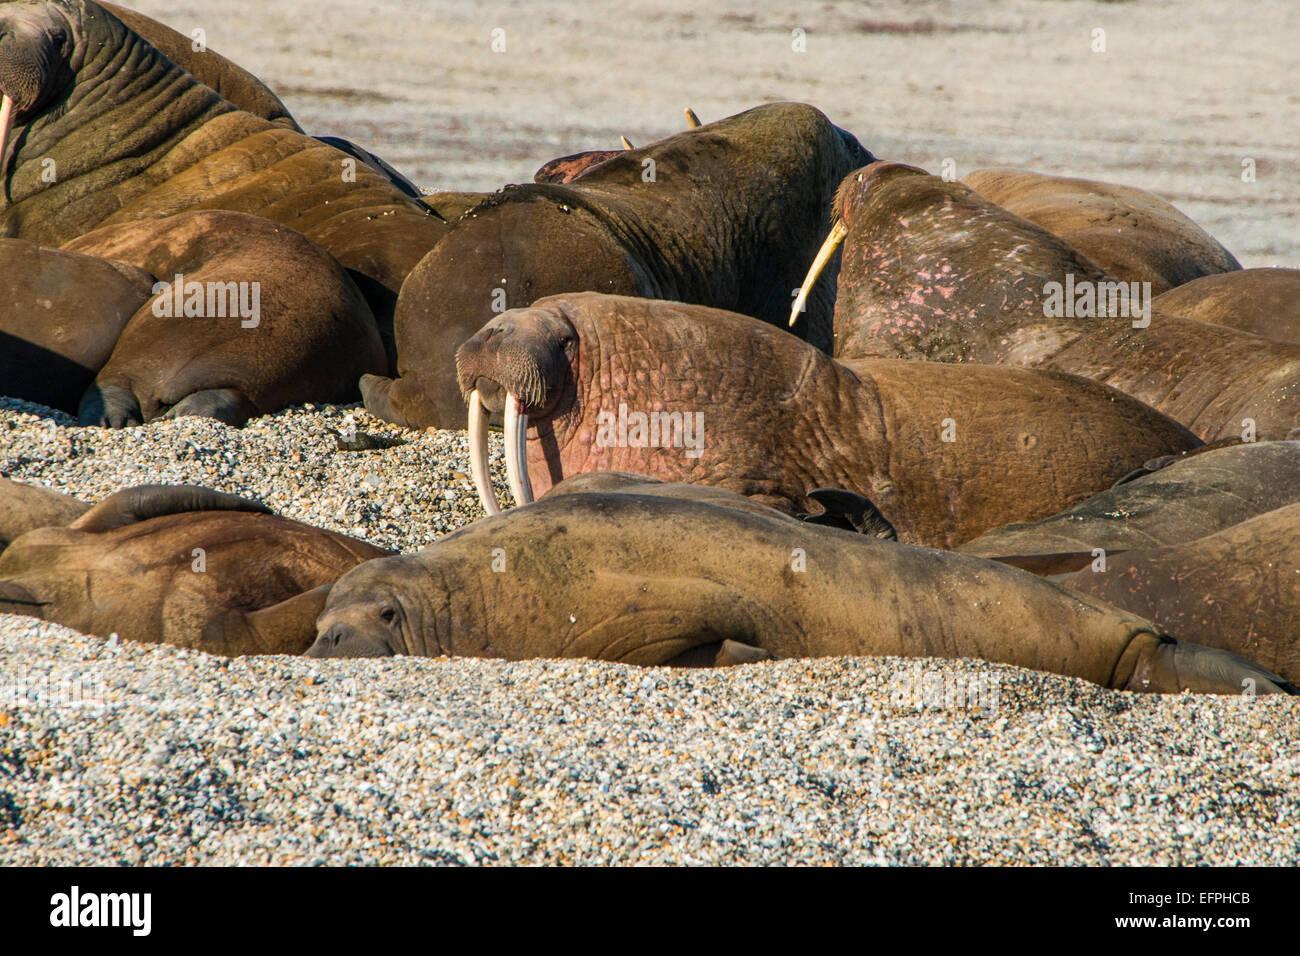 Walrus (Odobenus rosmarus) colony, Torellneset, Svalbard, Arctic, Norway, Scandinavia, Europe - Stock Image